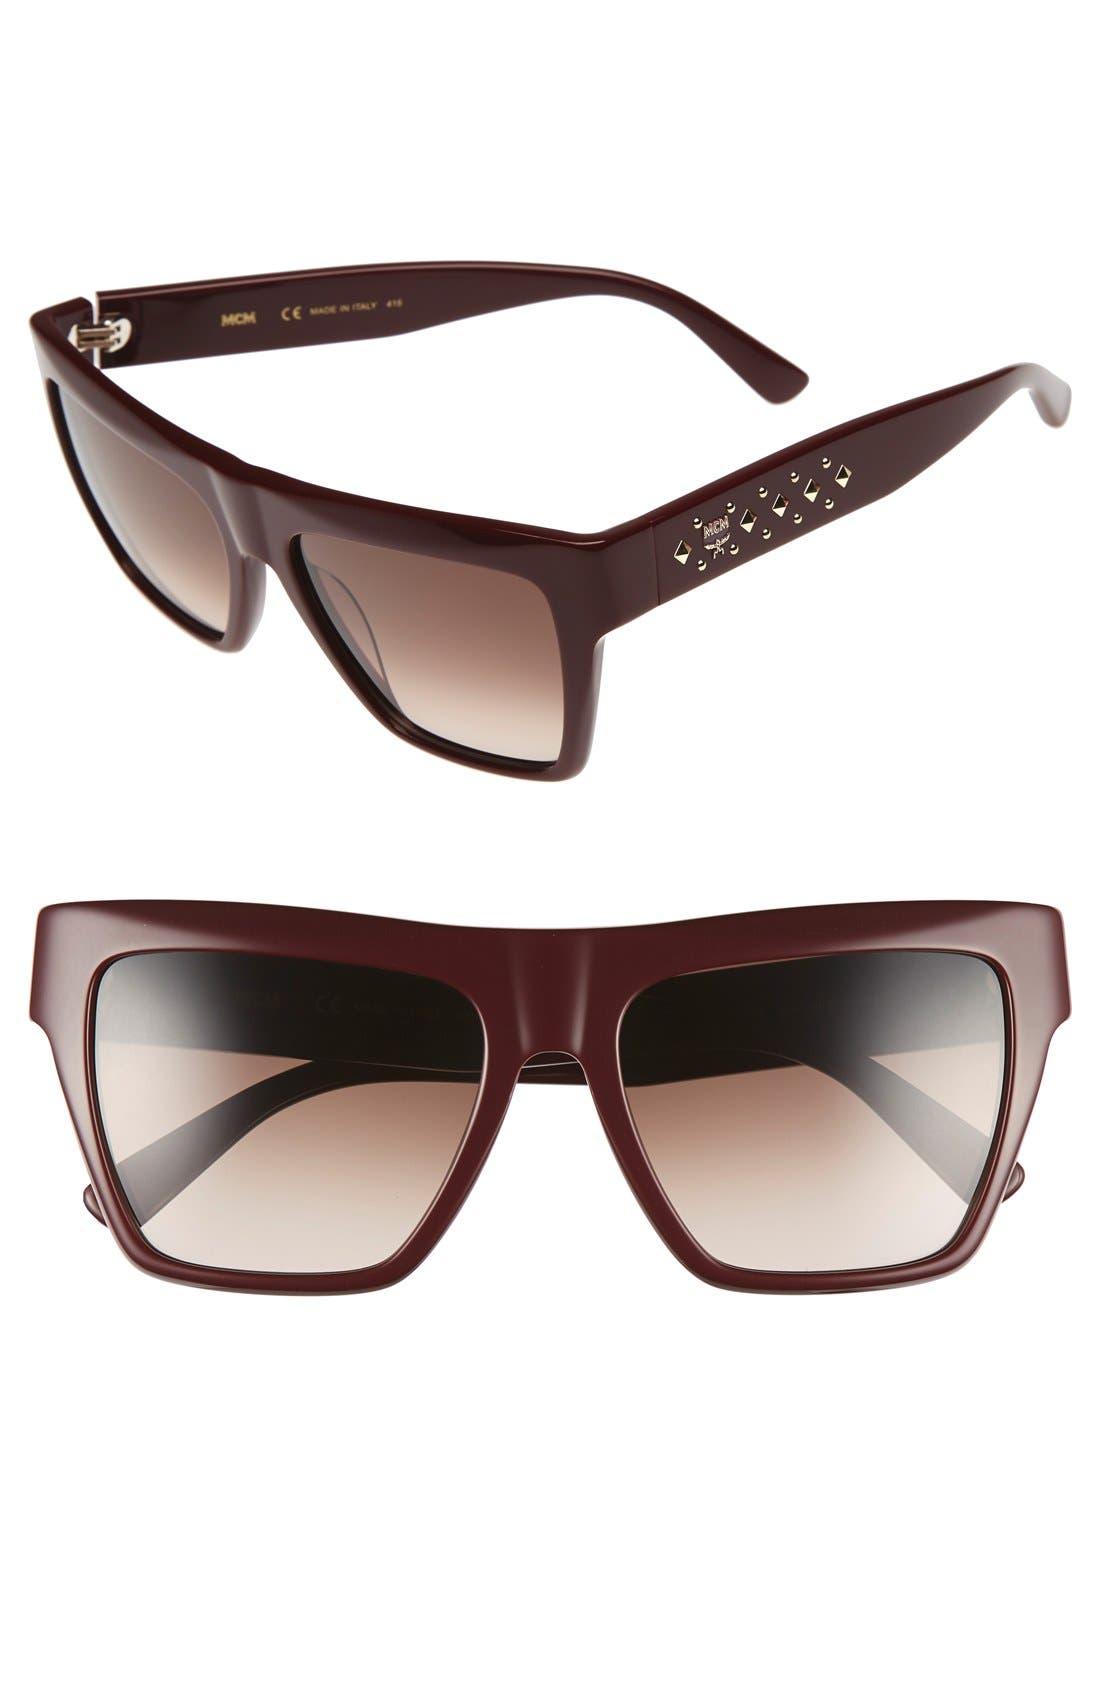 55mm Studded Navigator Sunglasses,                         Main,                         color, Burgundy